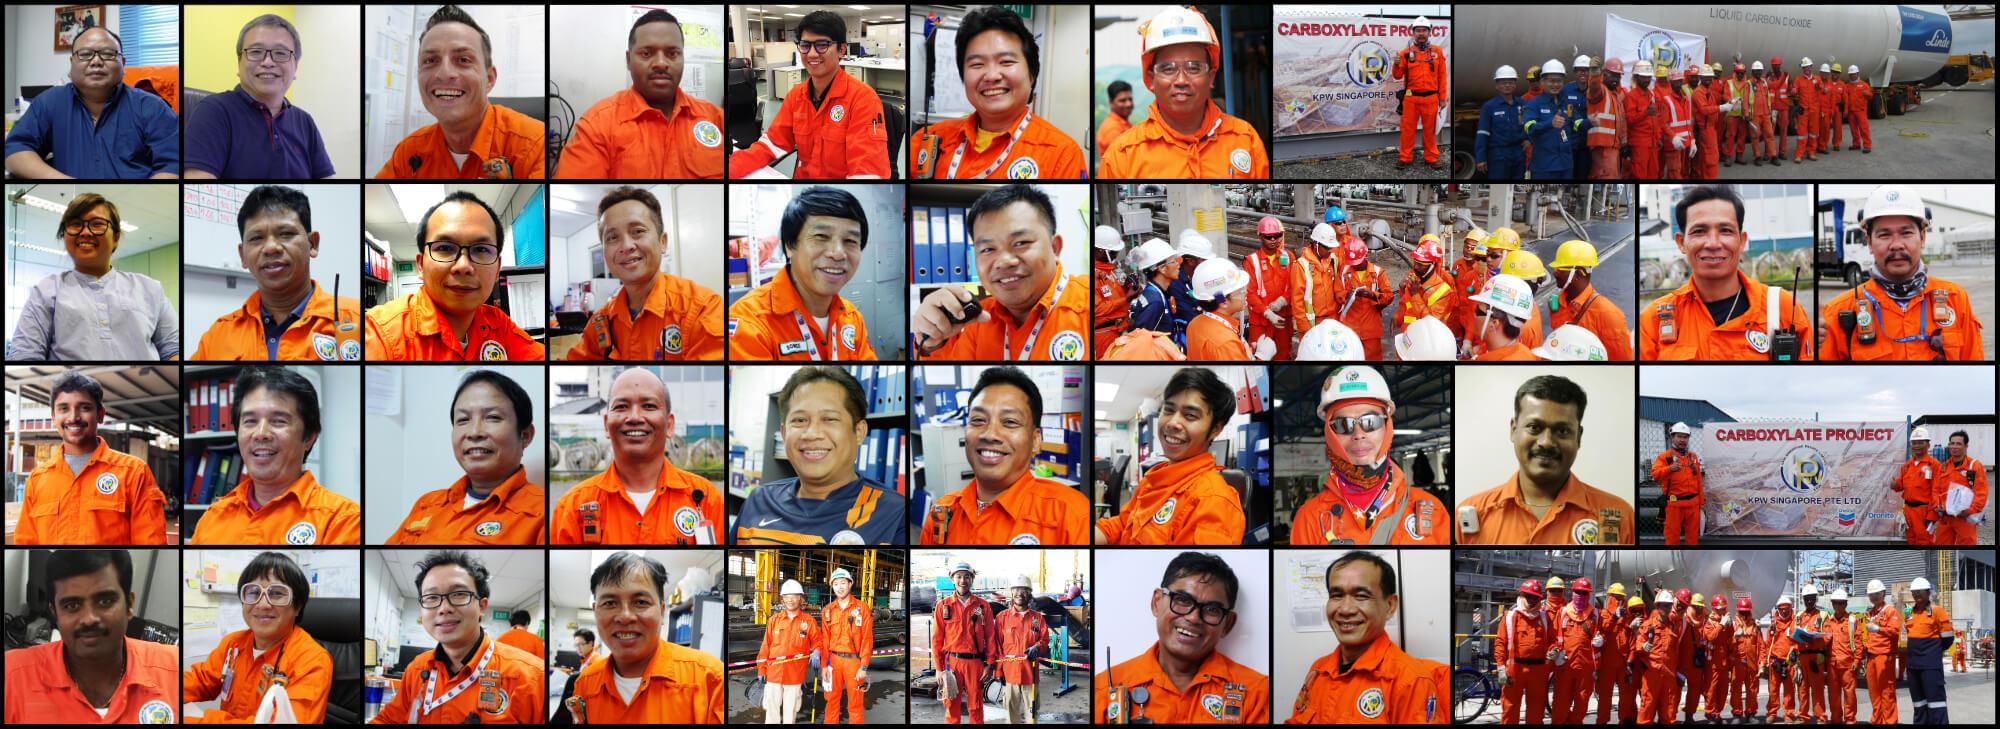 KPW_Staff_Collage_V5-c